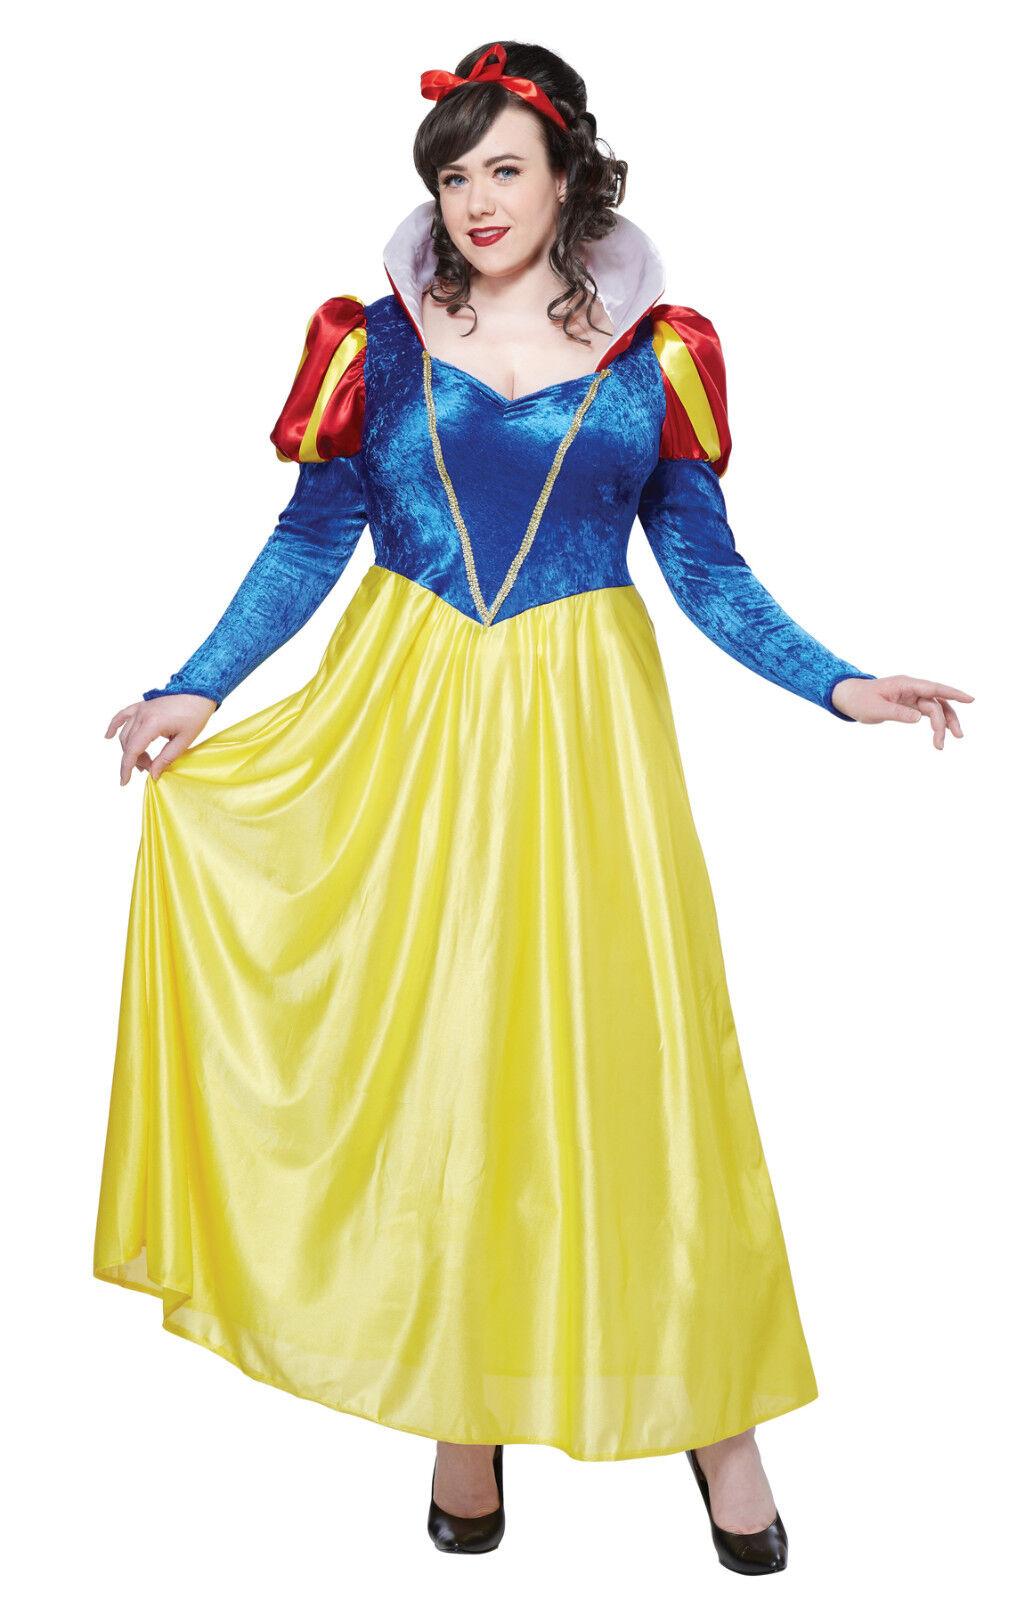 Classic Snow White Plus Size Adult Costume | eBay  Original Snow White Costume